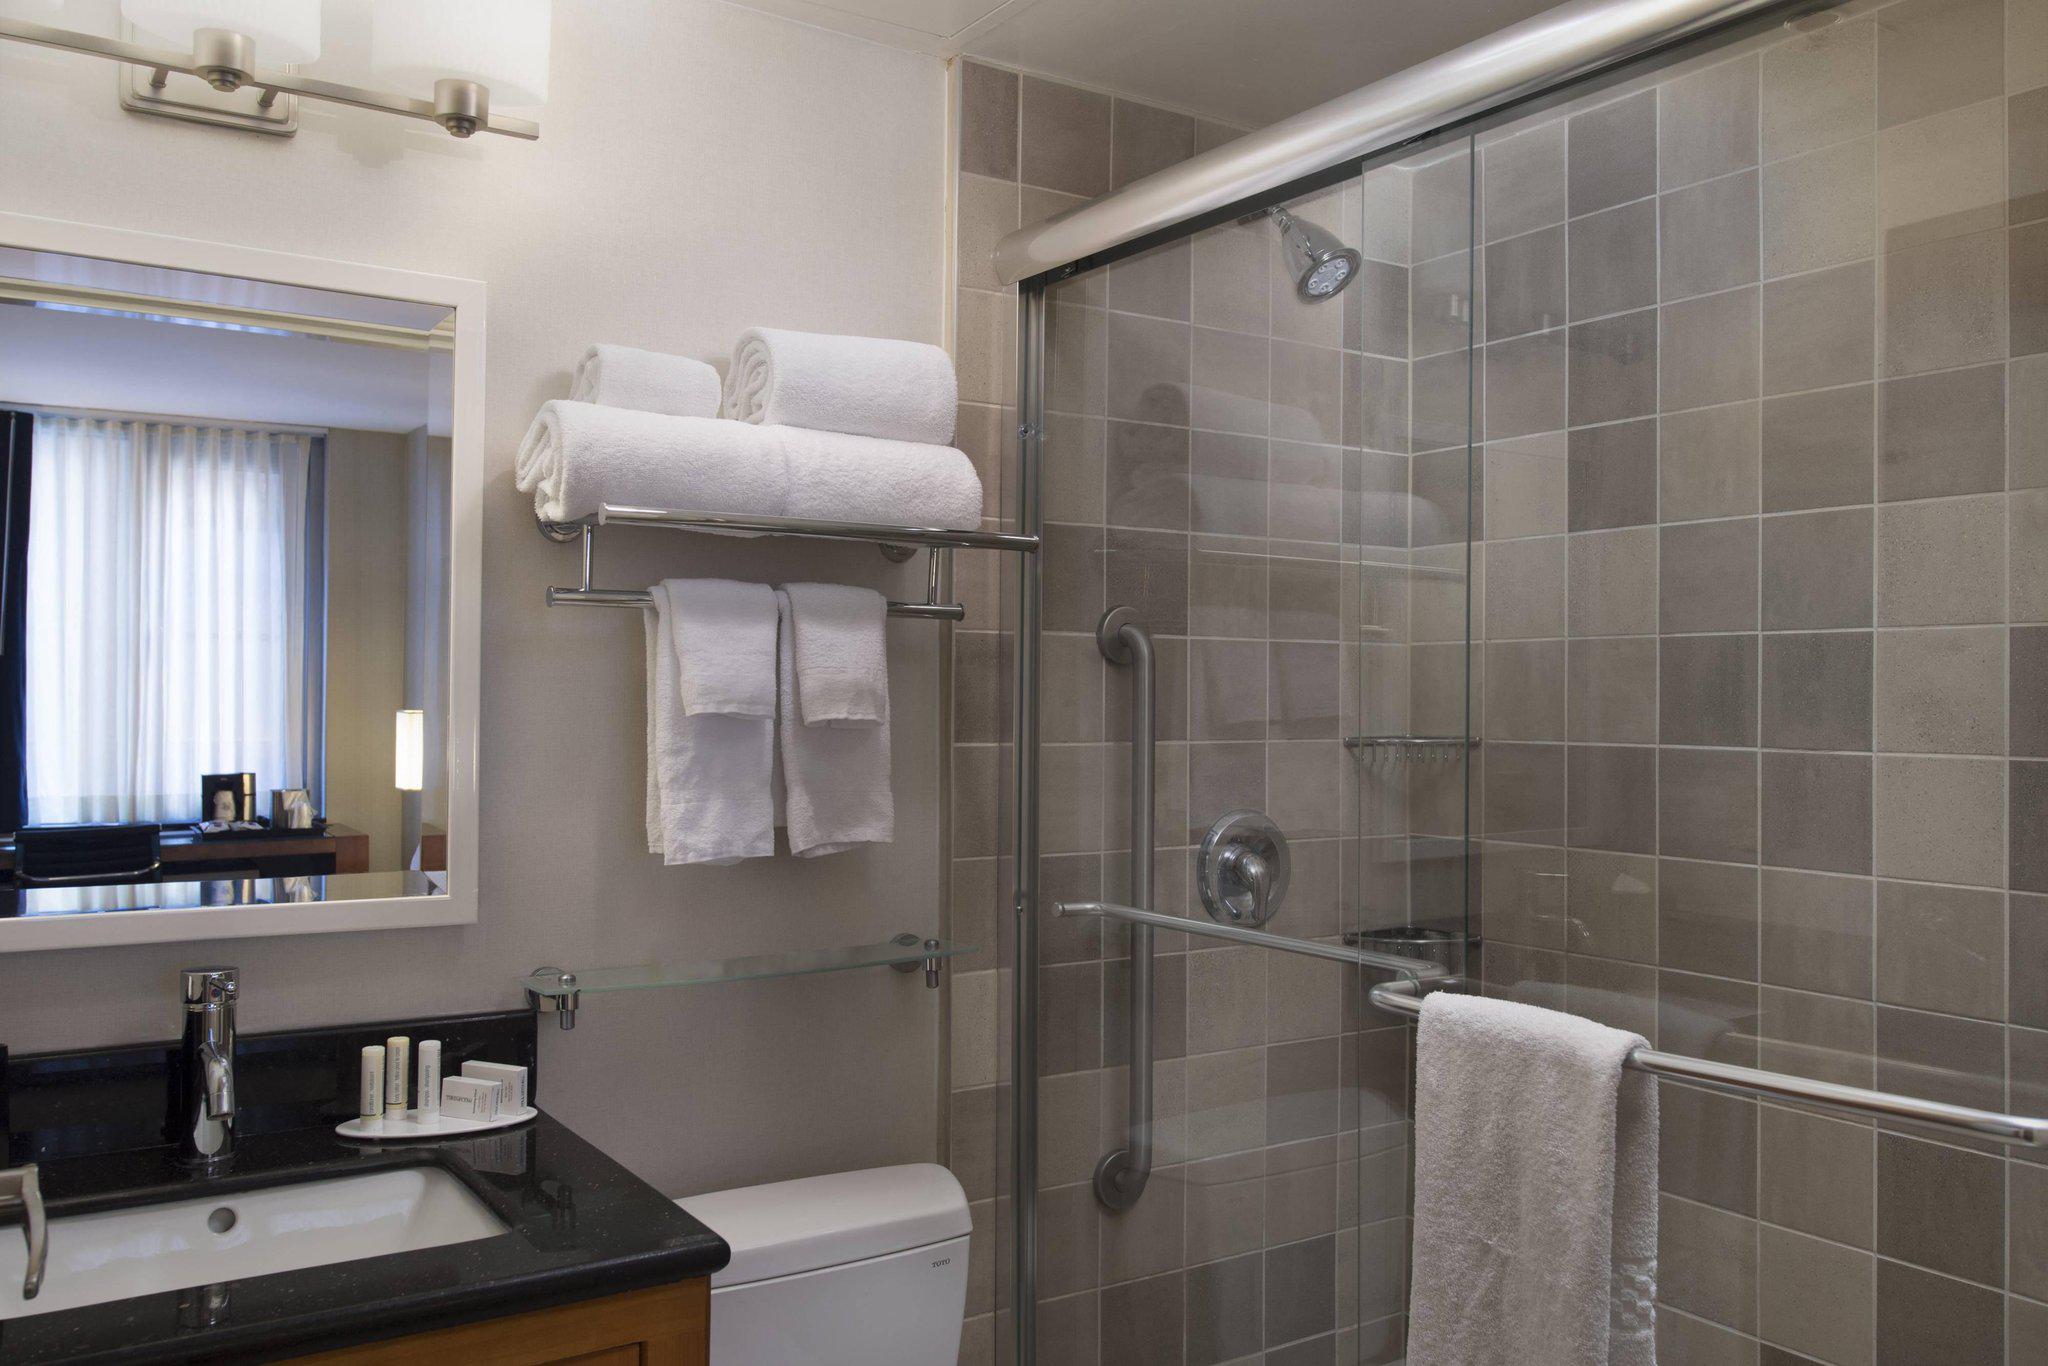 Fairfield Inn & Suites by Marriott New York Manhattan/Fifth Avenue